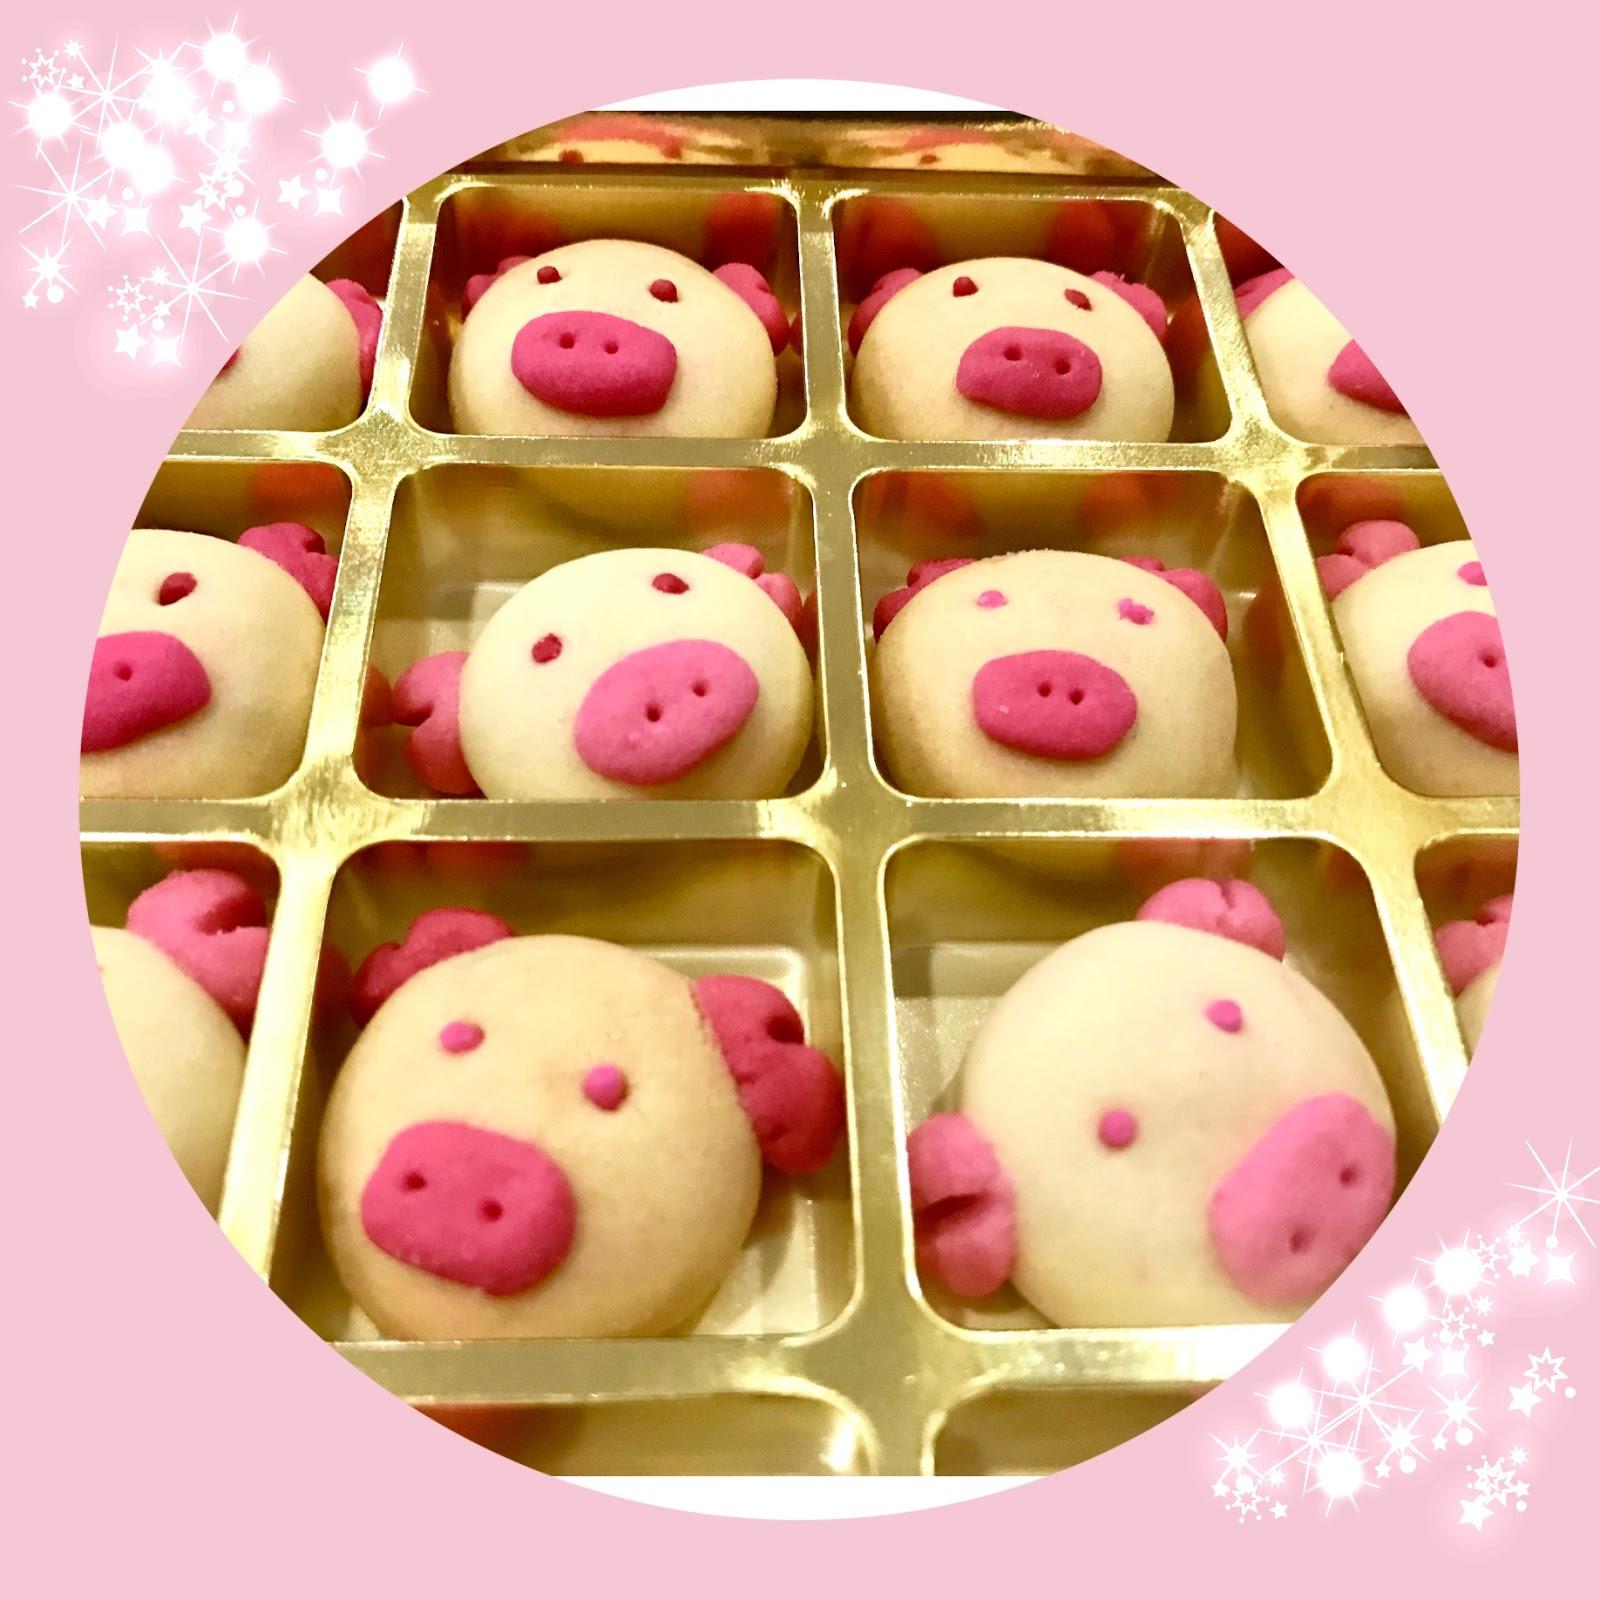 Sweetots Homemade Chinese New Year Cookies - 2019: Chinese ...